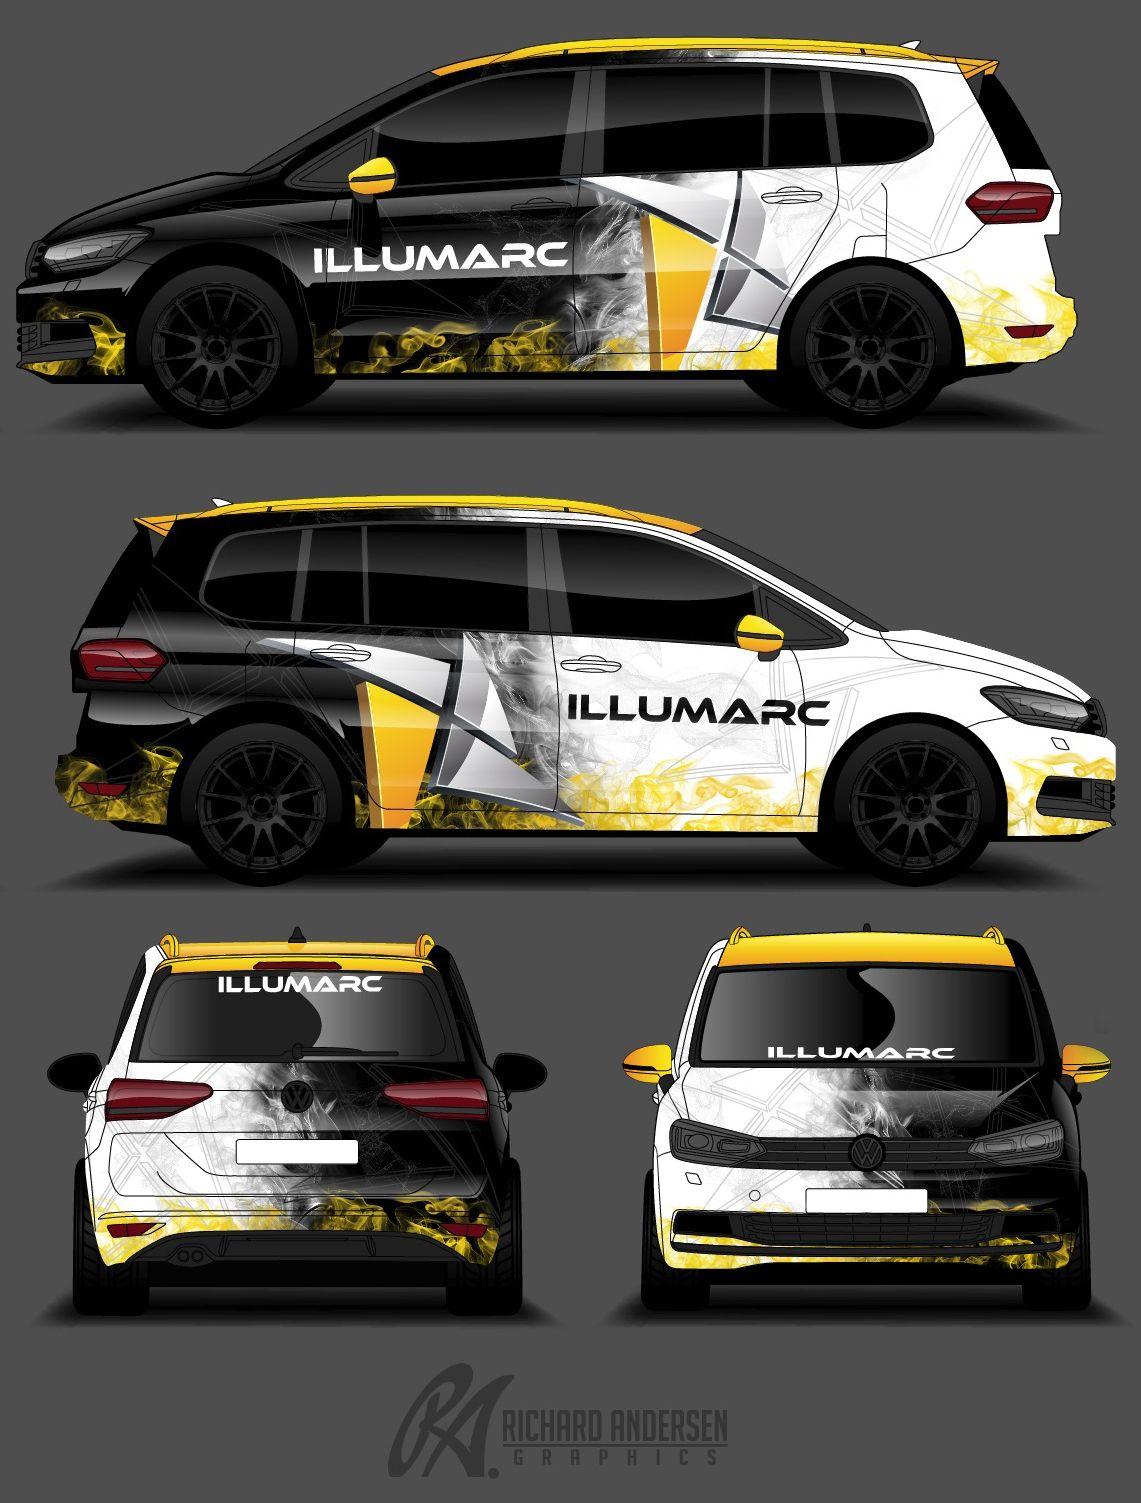 Ra graphics van wrap design vans vehicle signage van wrap car wrap